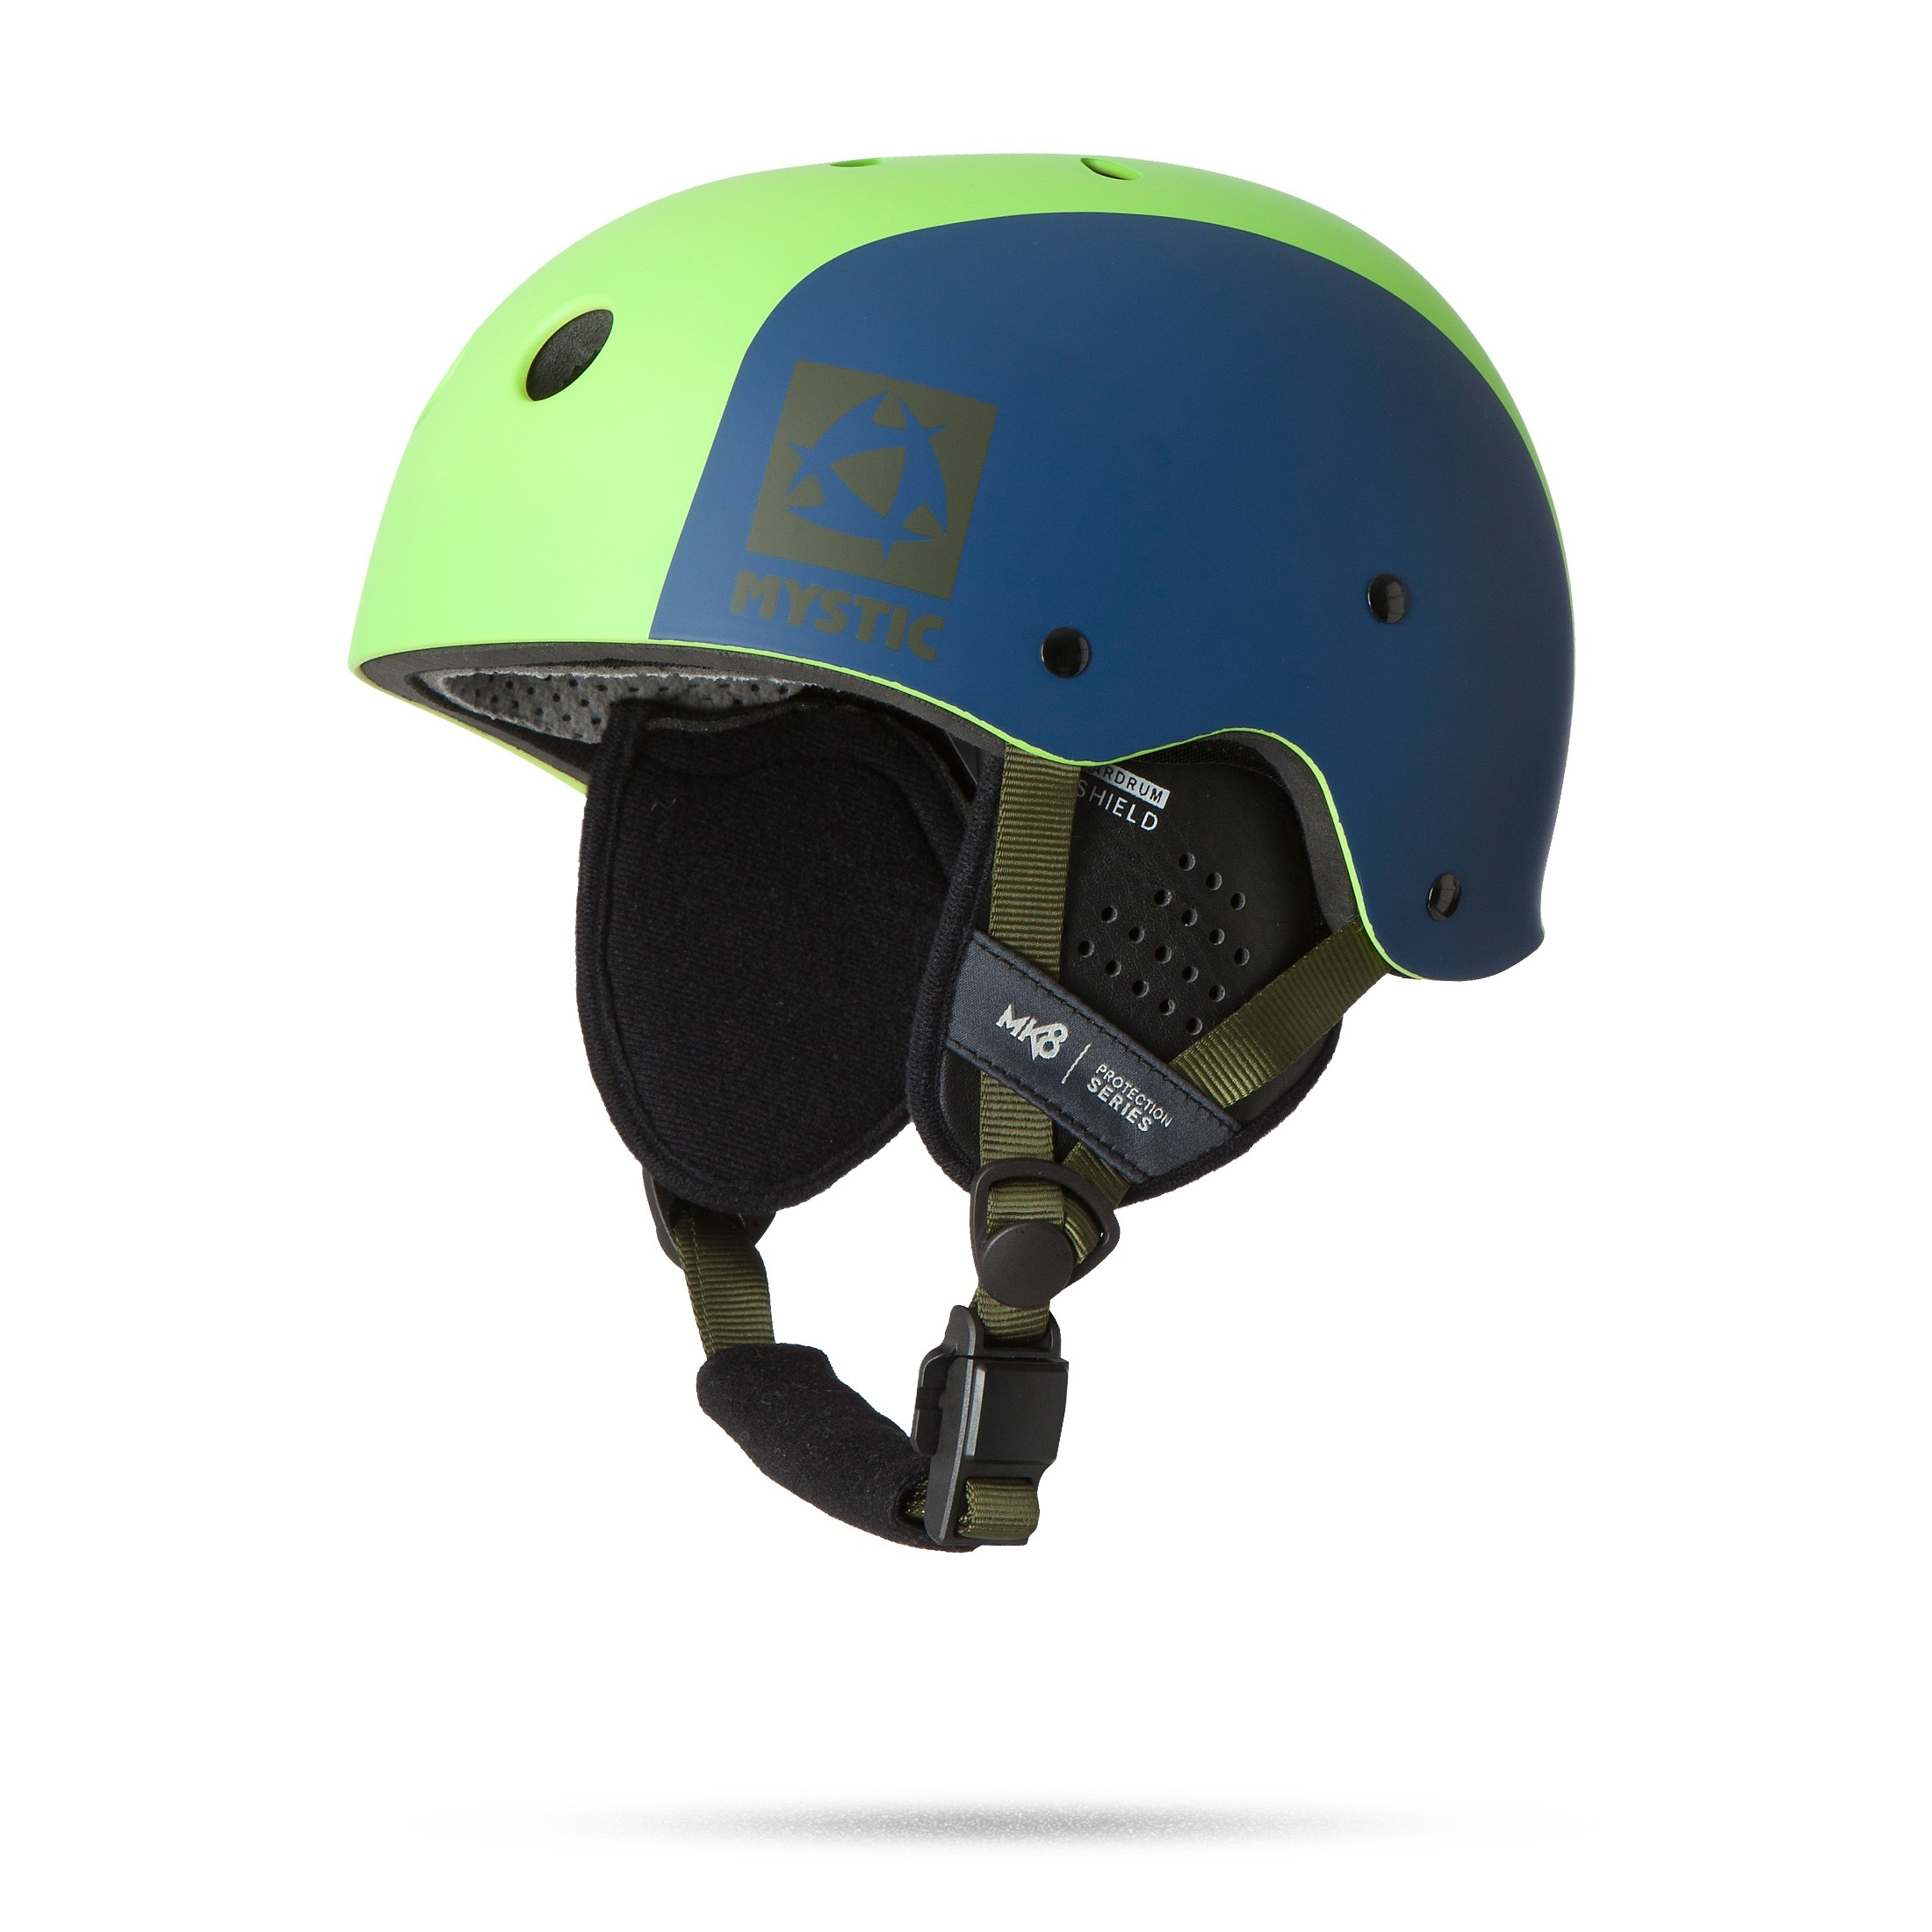 Helmets / Impact Vests